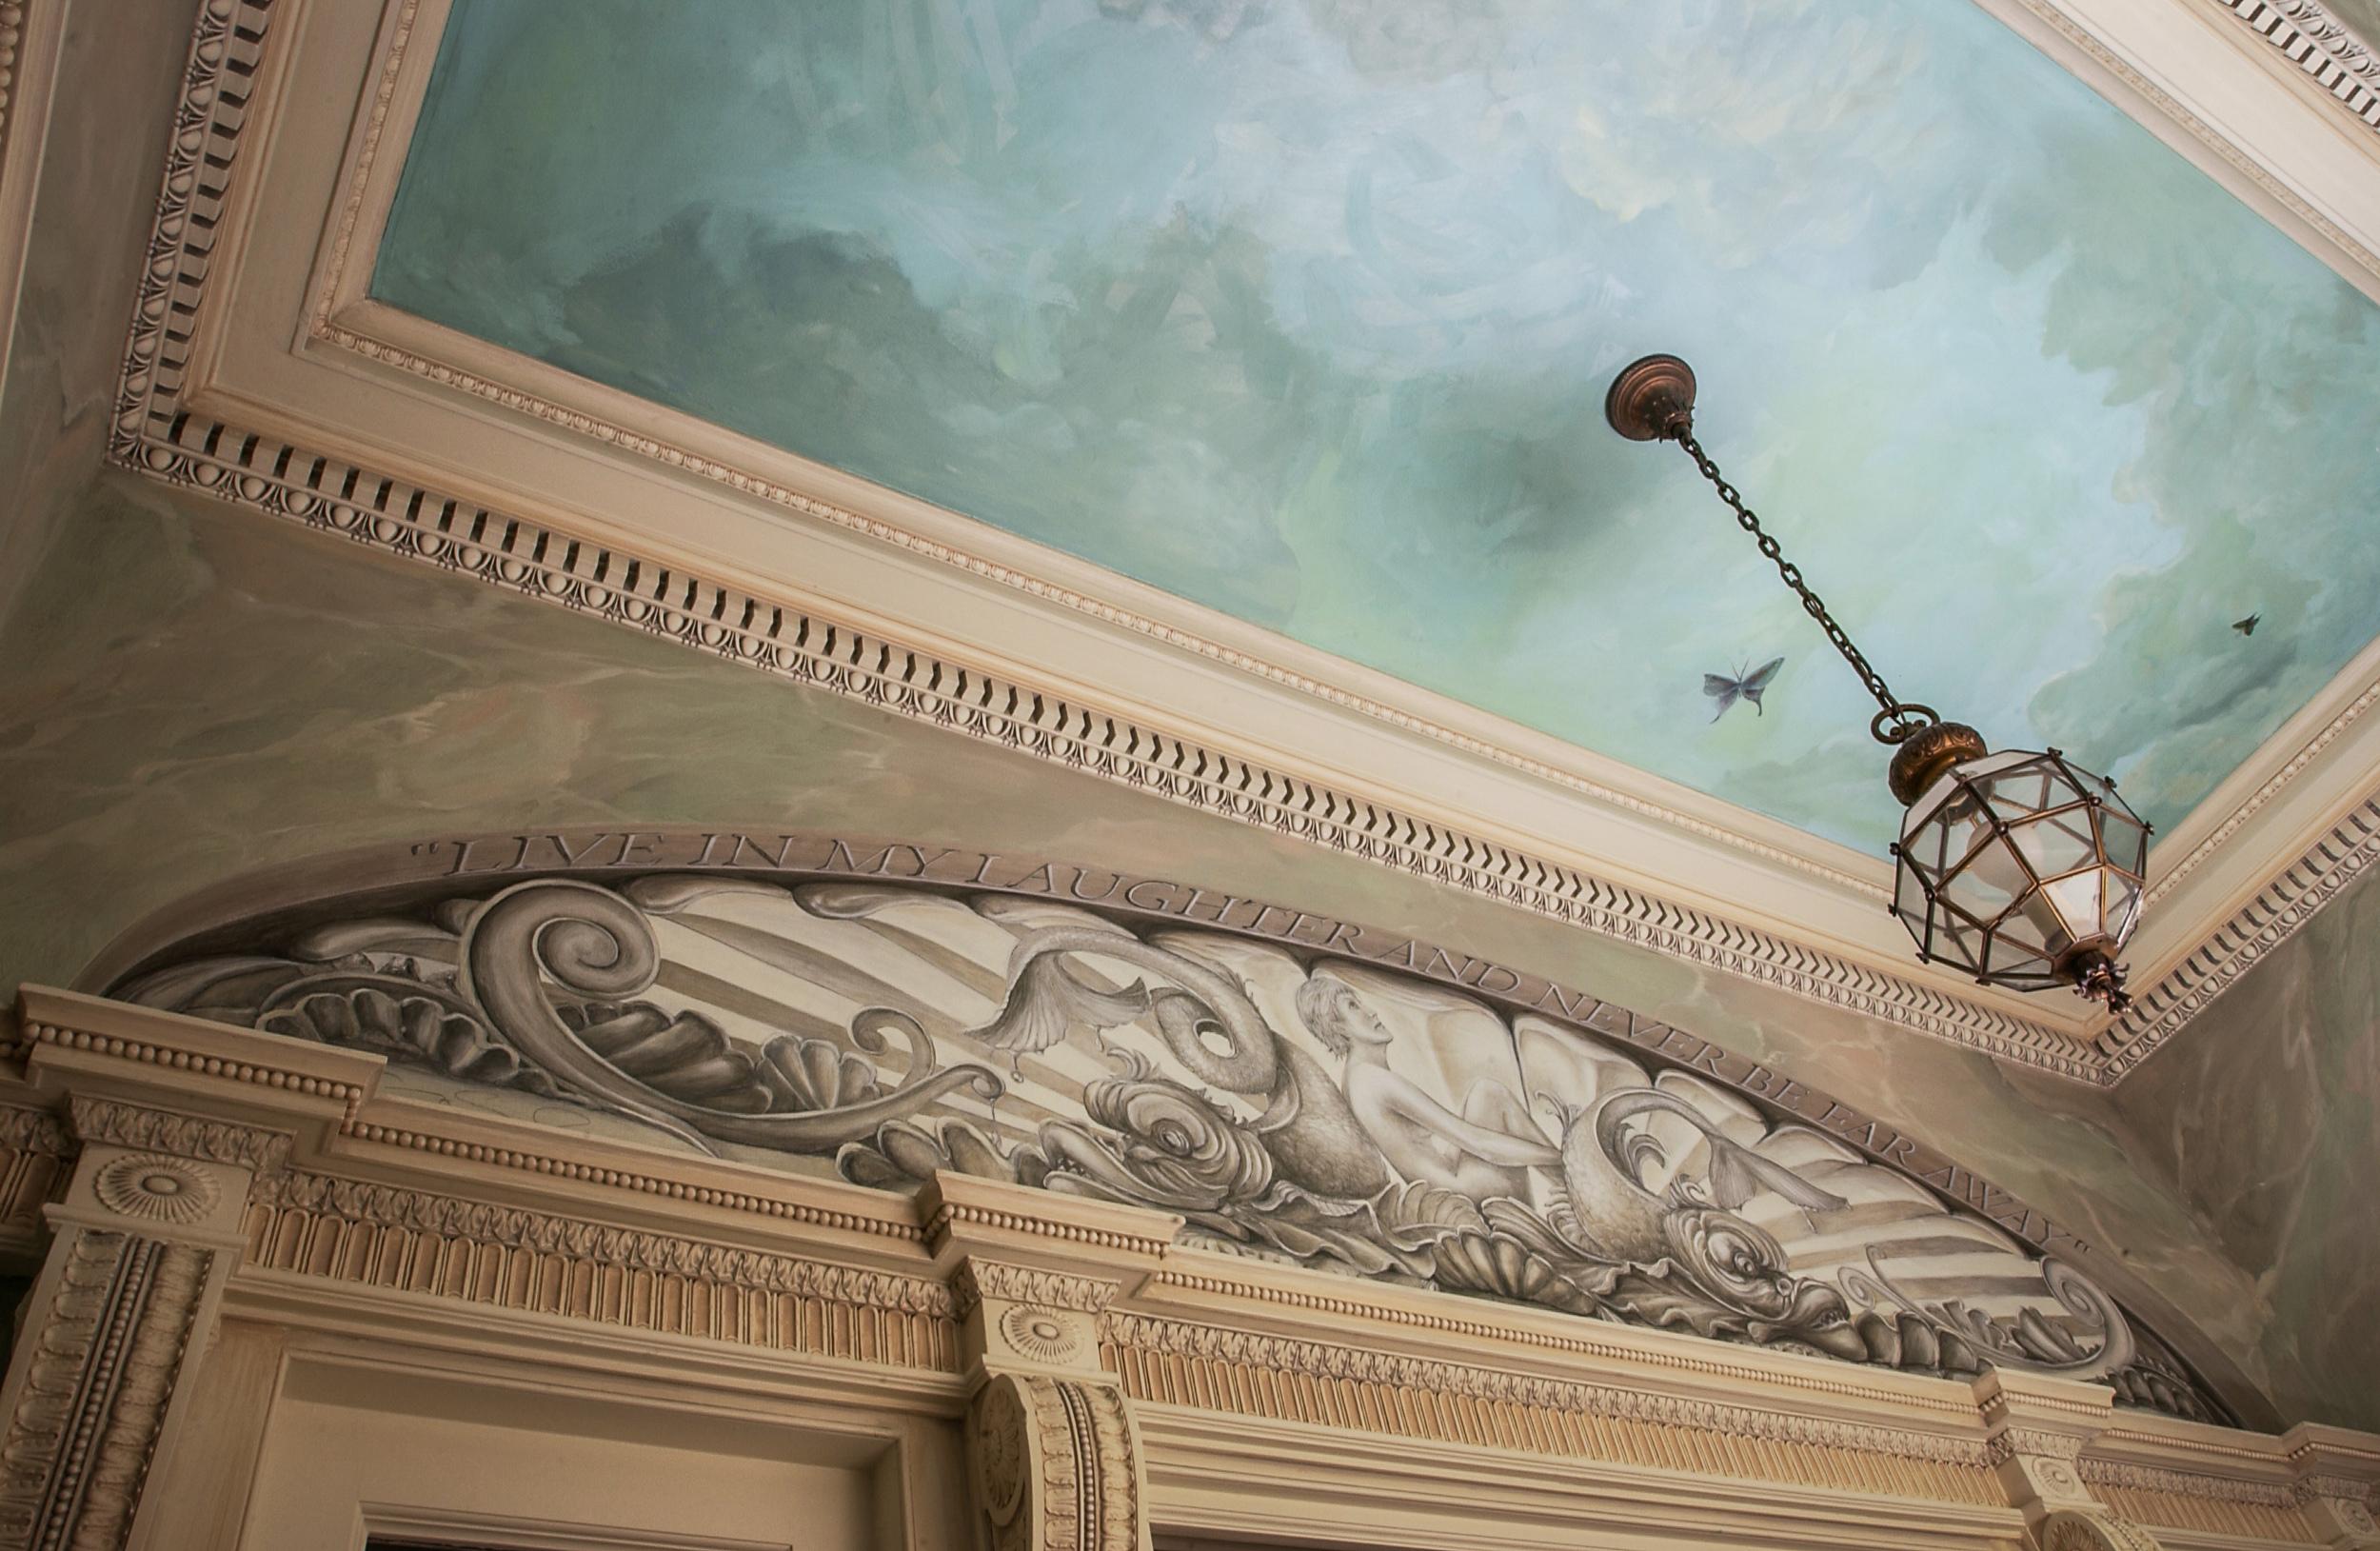 Tate Residence Vesitbule Ceiling Murals